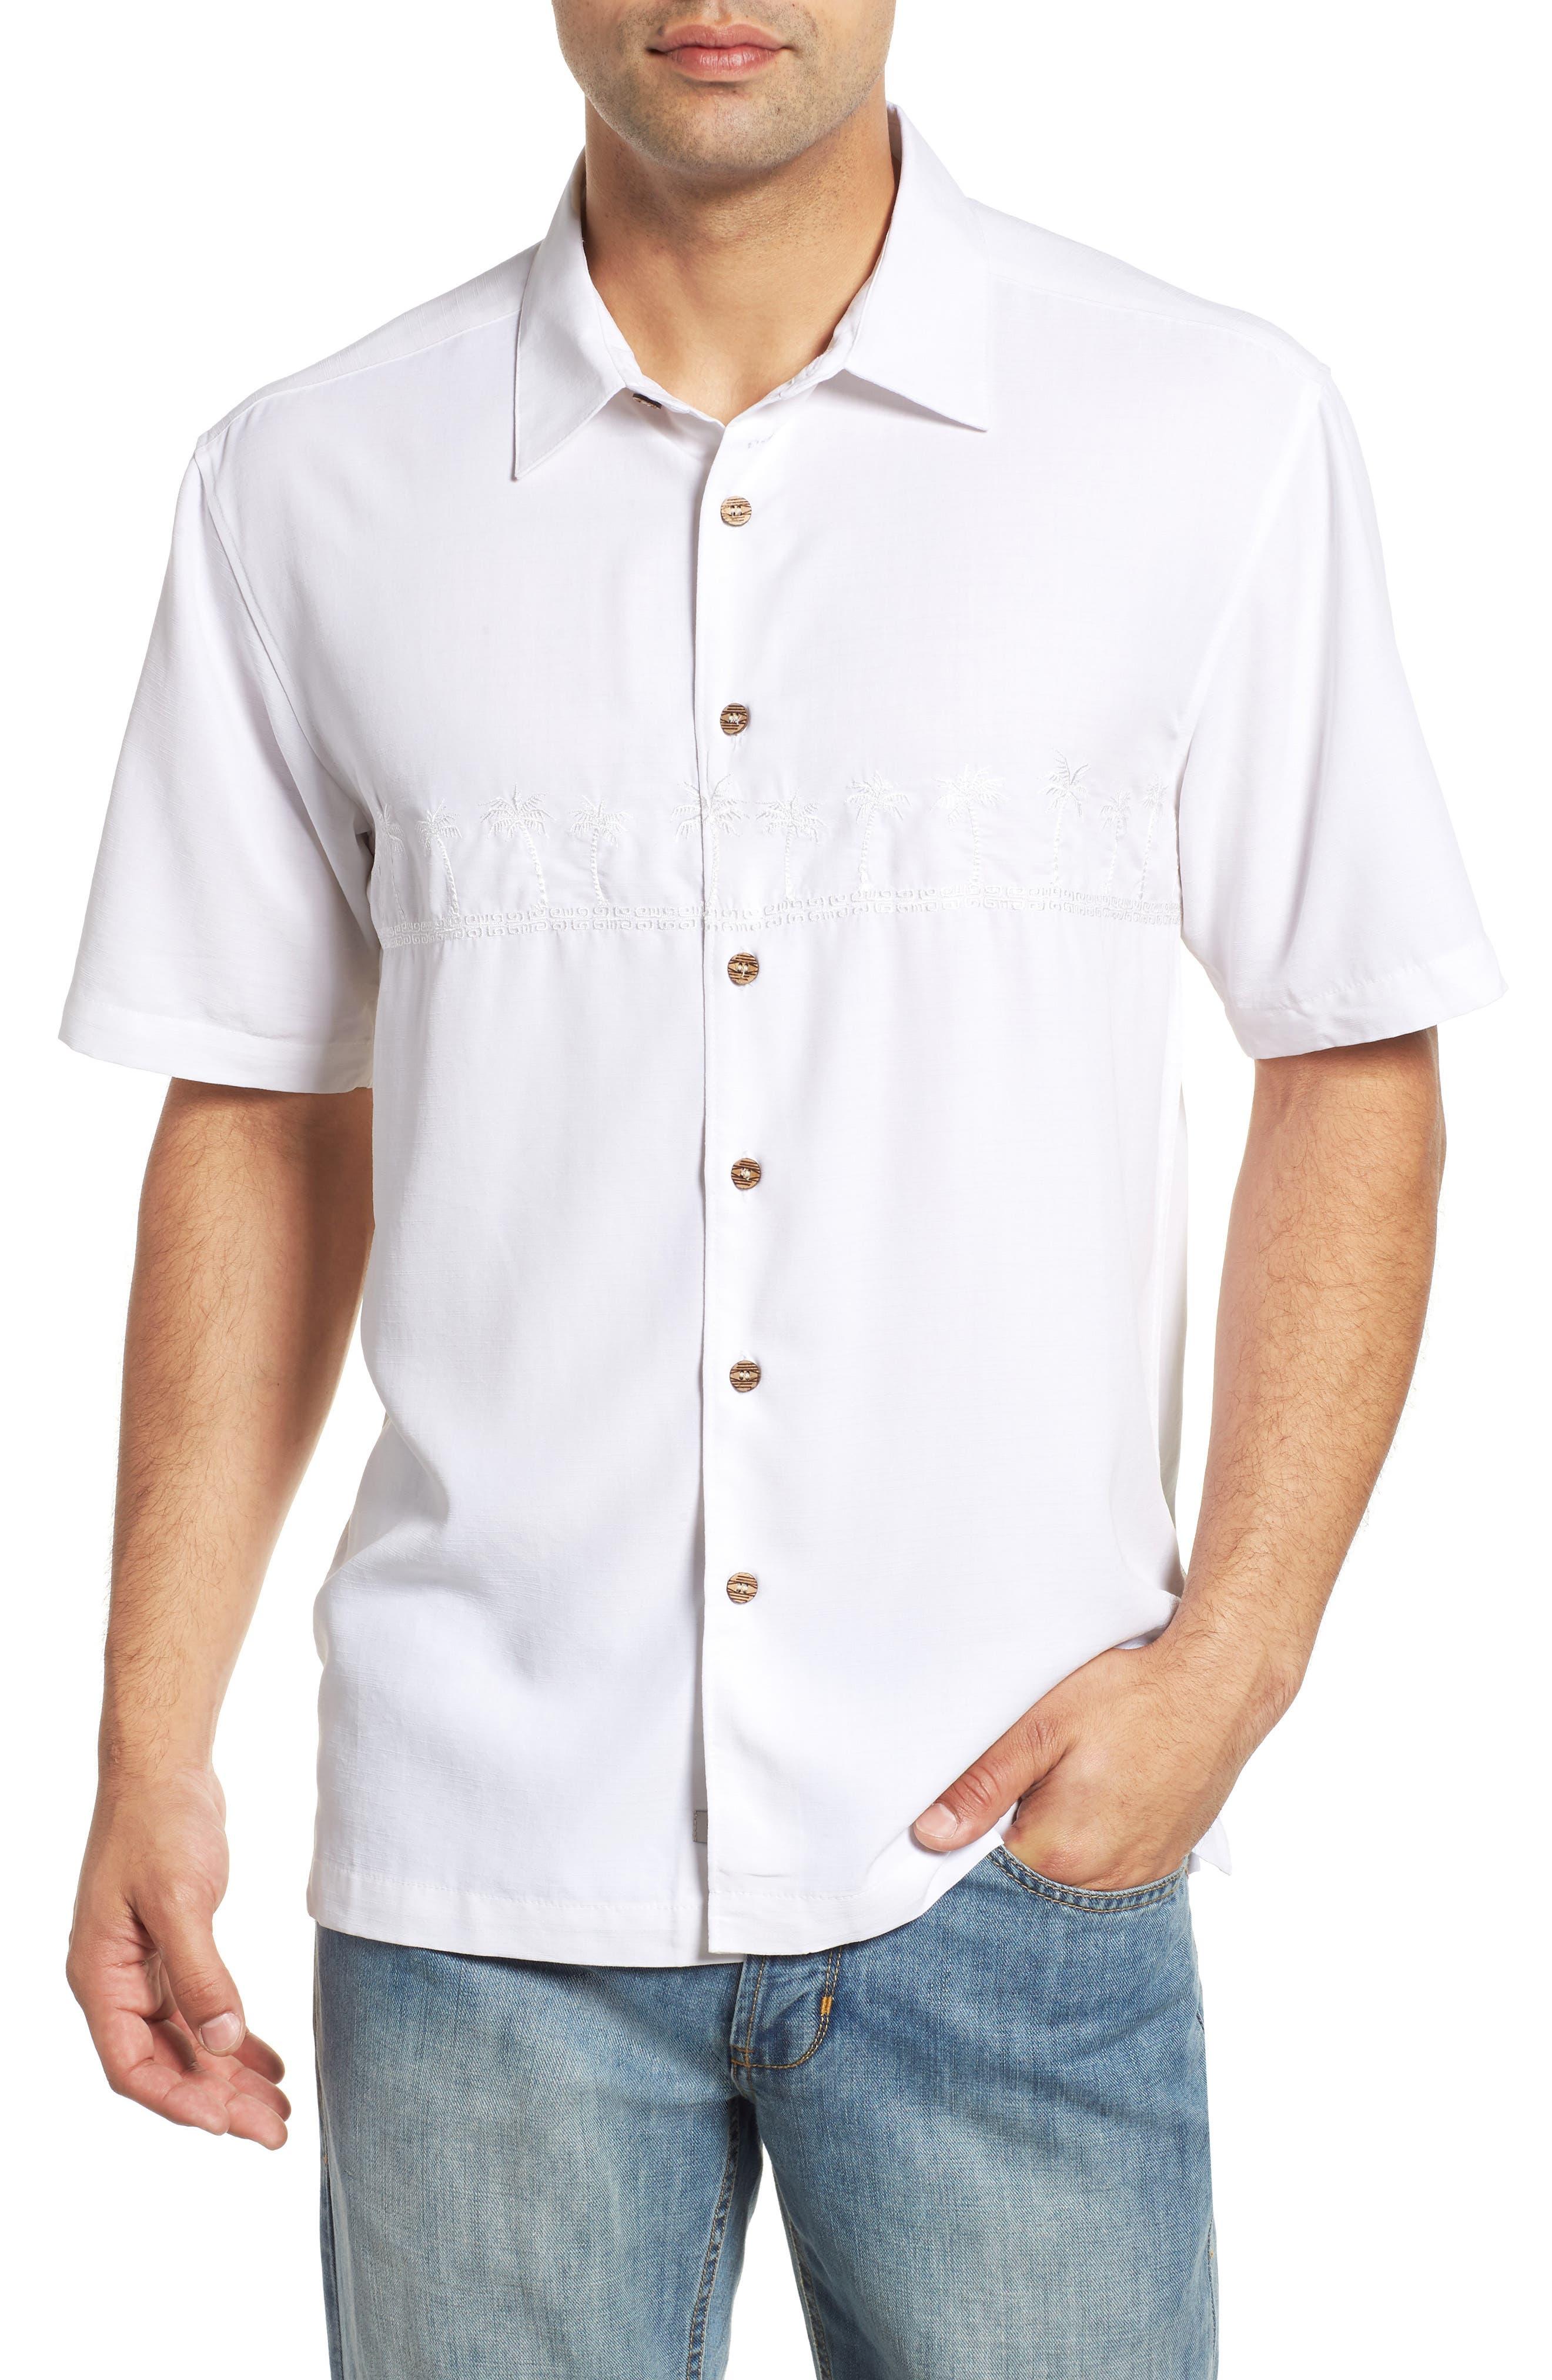 Quiksilver Waterman Collection Tahiti Palms Regular Fit Sport Shirt, White